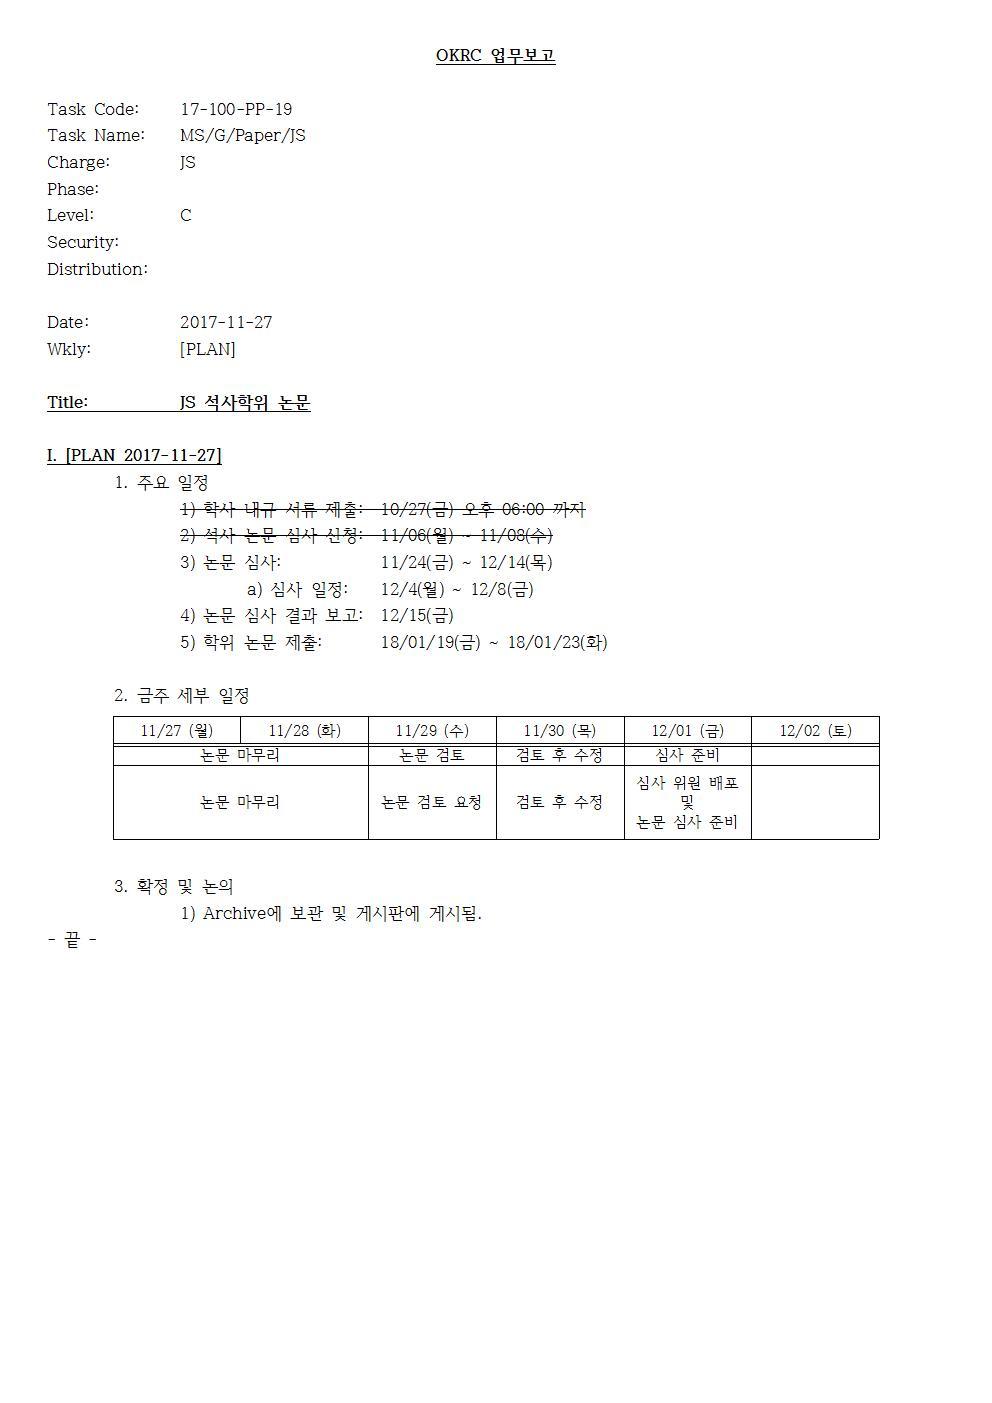 D-[17-100-PP-19]-[MS-G-Paper-JS]-[JS]-[2017-11-27]-[PLAN]001.jpg